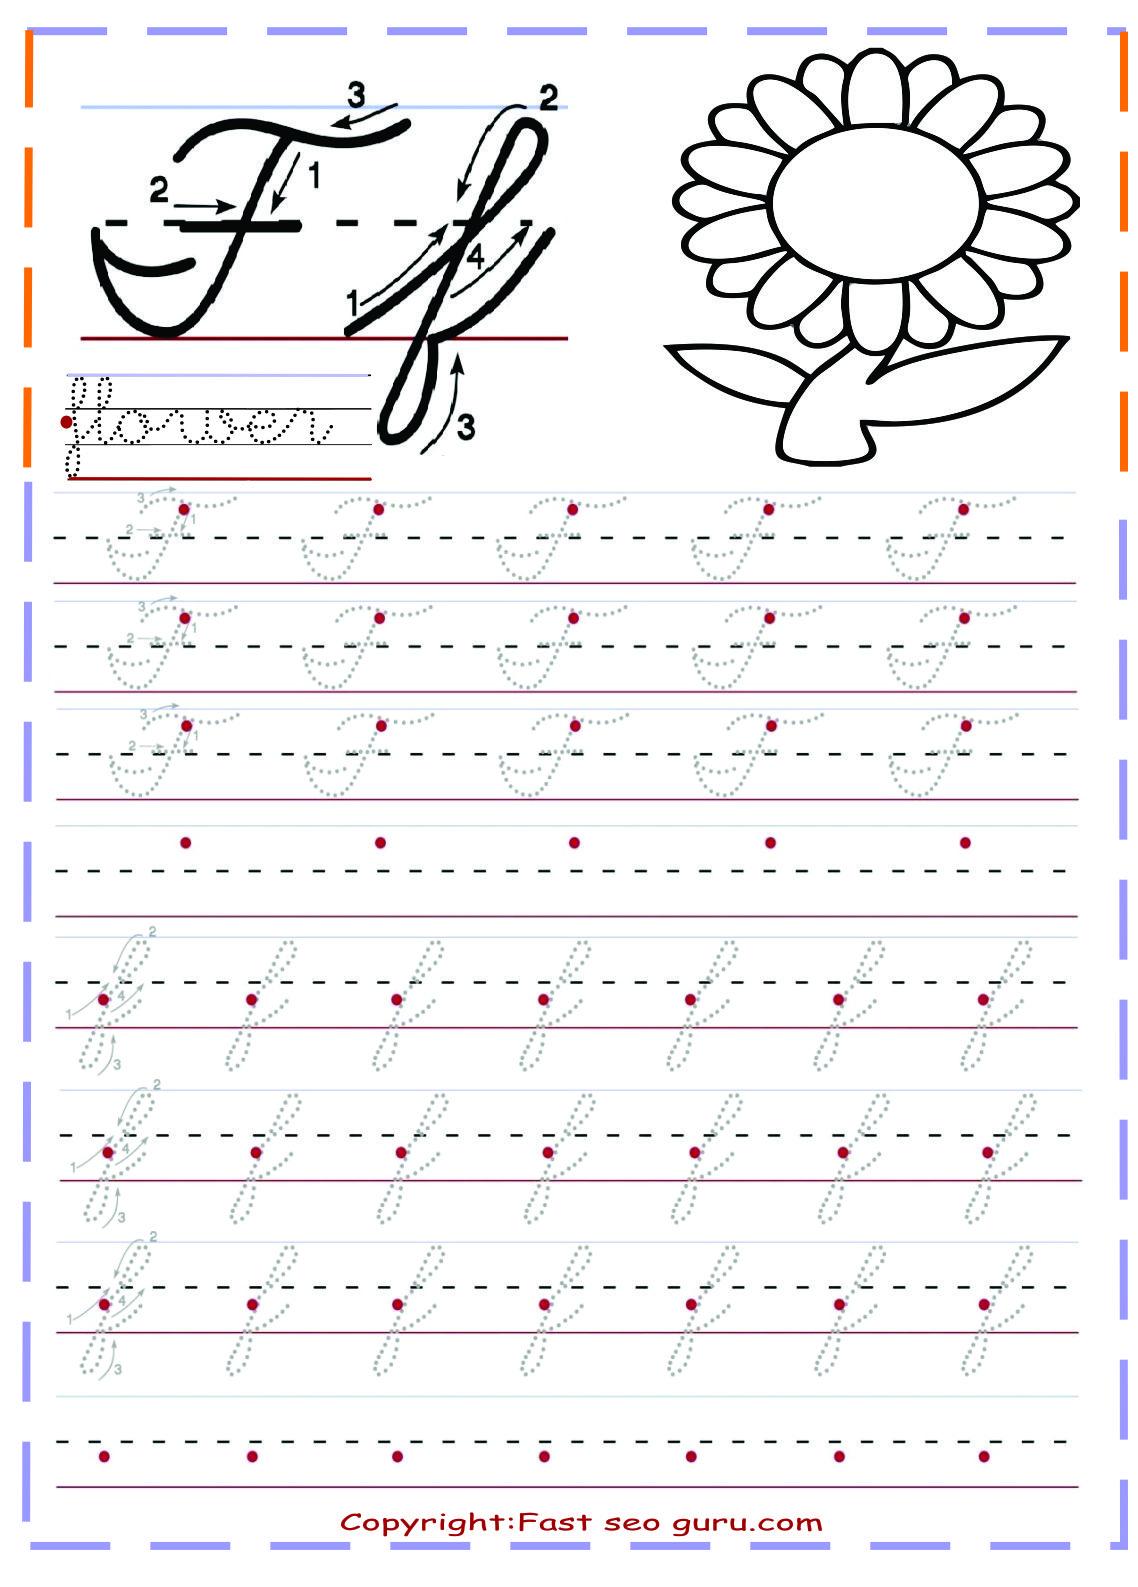 Cursive Handwriting Tracing Worksheets For Practice Letter F in Letter Tracing Worksheets Cursive